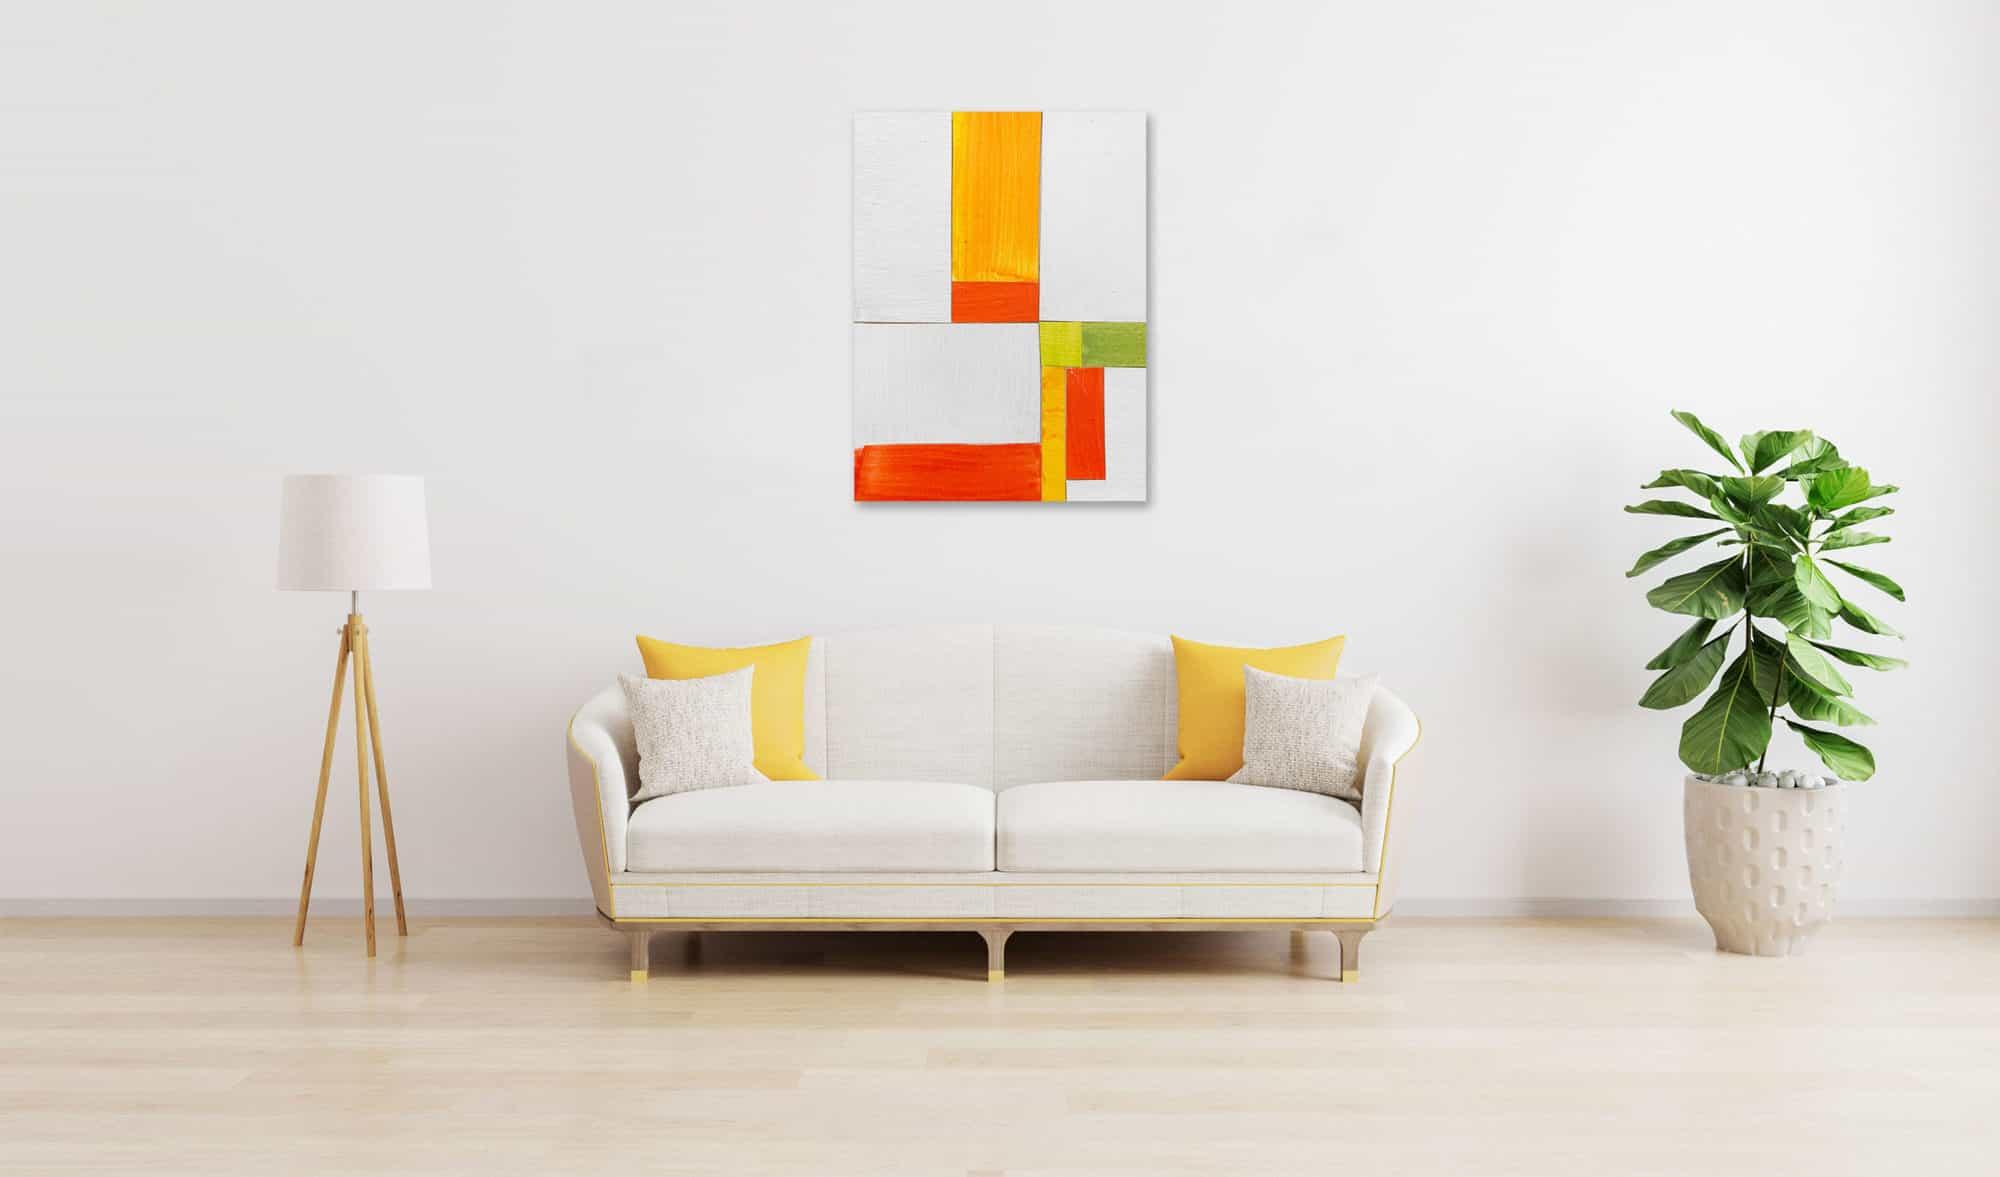 Acrylbild geordnetes Orange wandbild